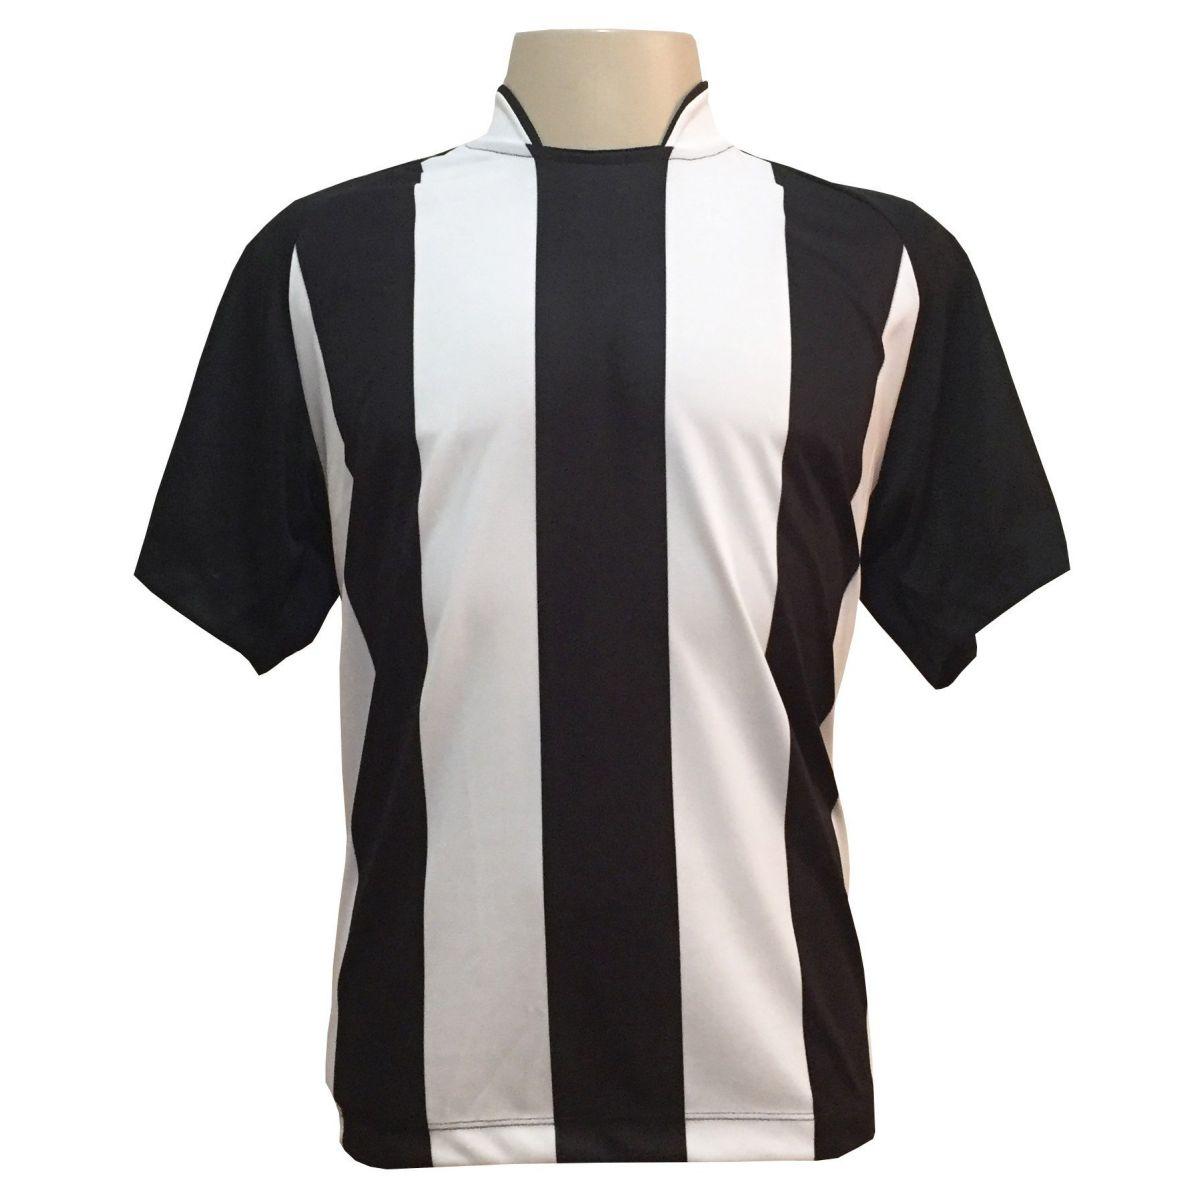 uniformes de futebol de campo completo 3917aa09147a8